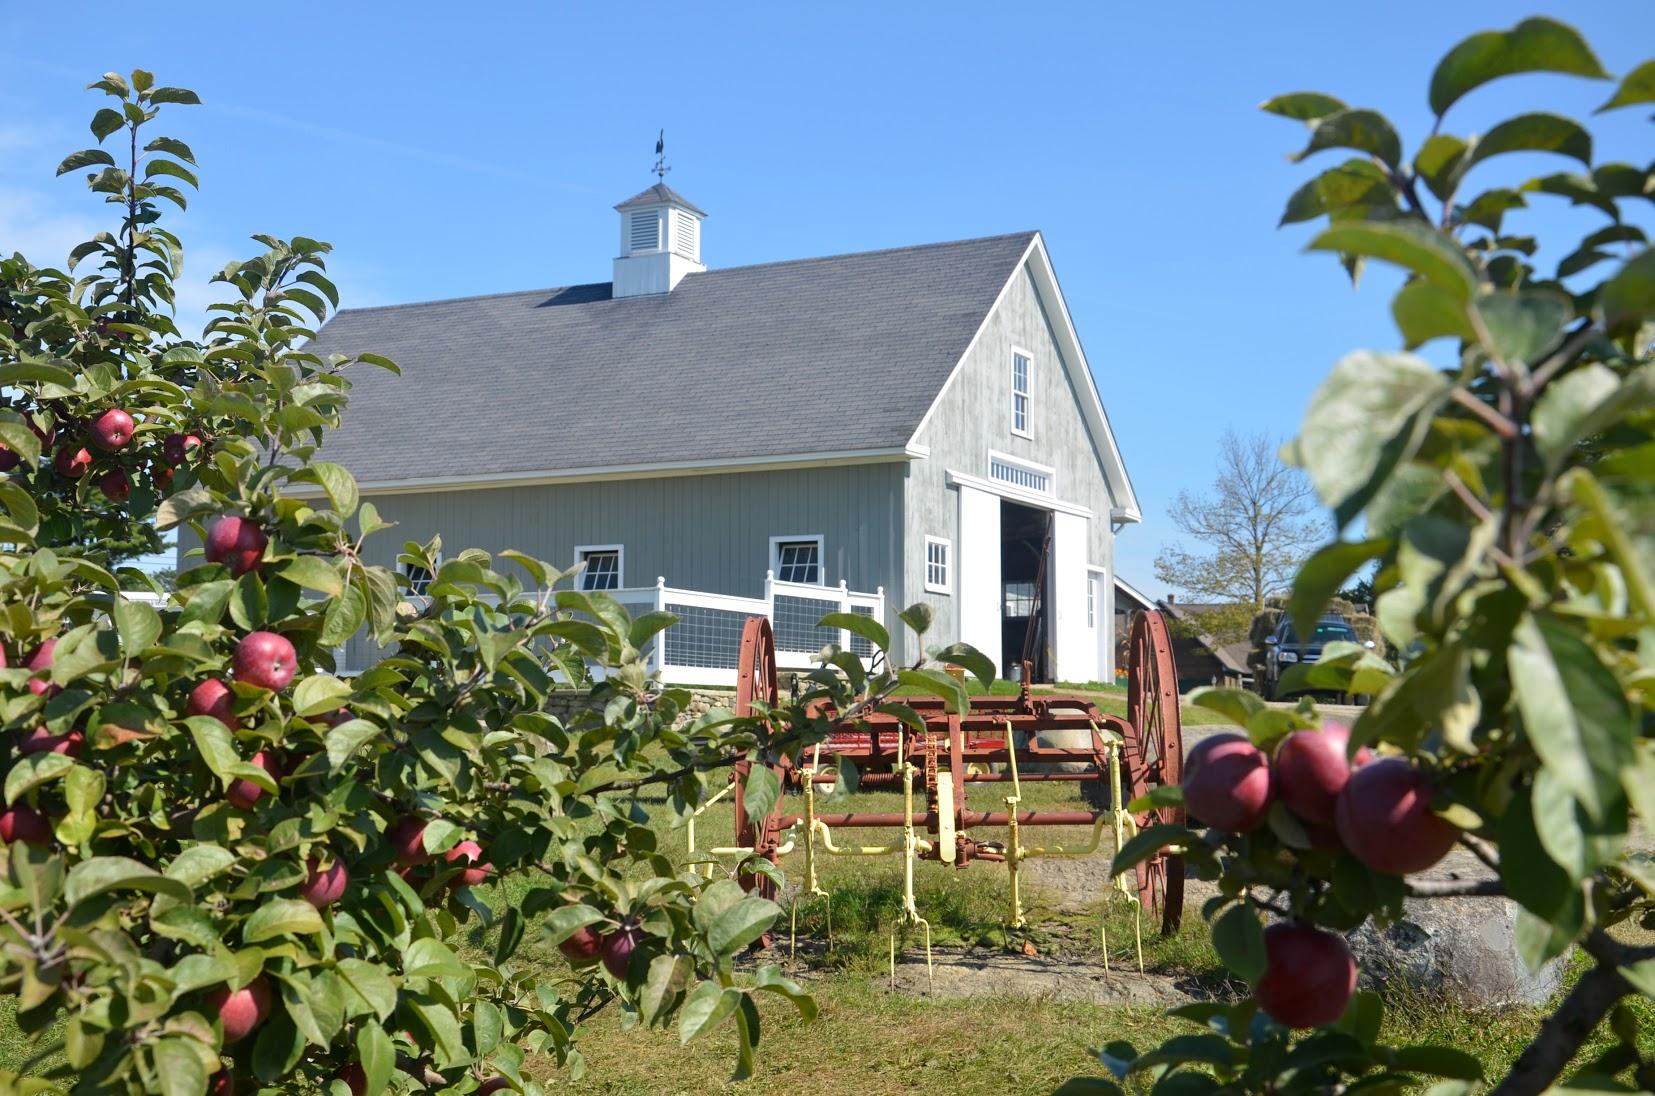 Barn and Apples-1.JPG